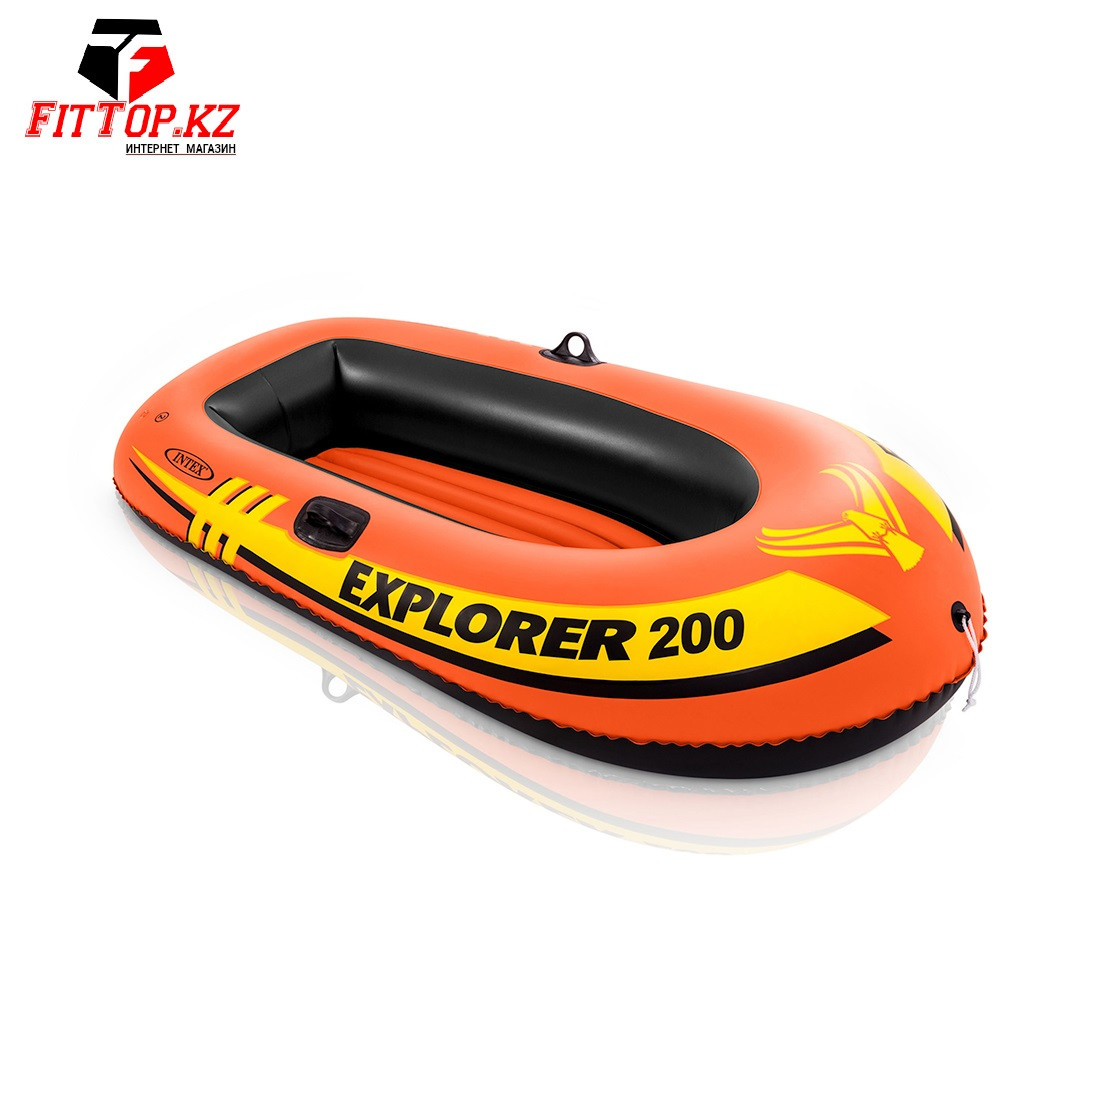 Лодка надувная Exlorer 200 (185х94 см) INTEX 58330NP 6+